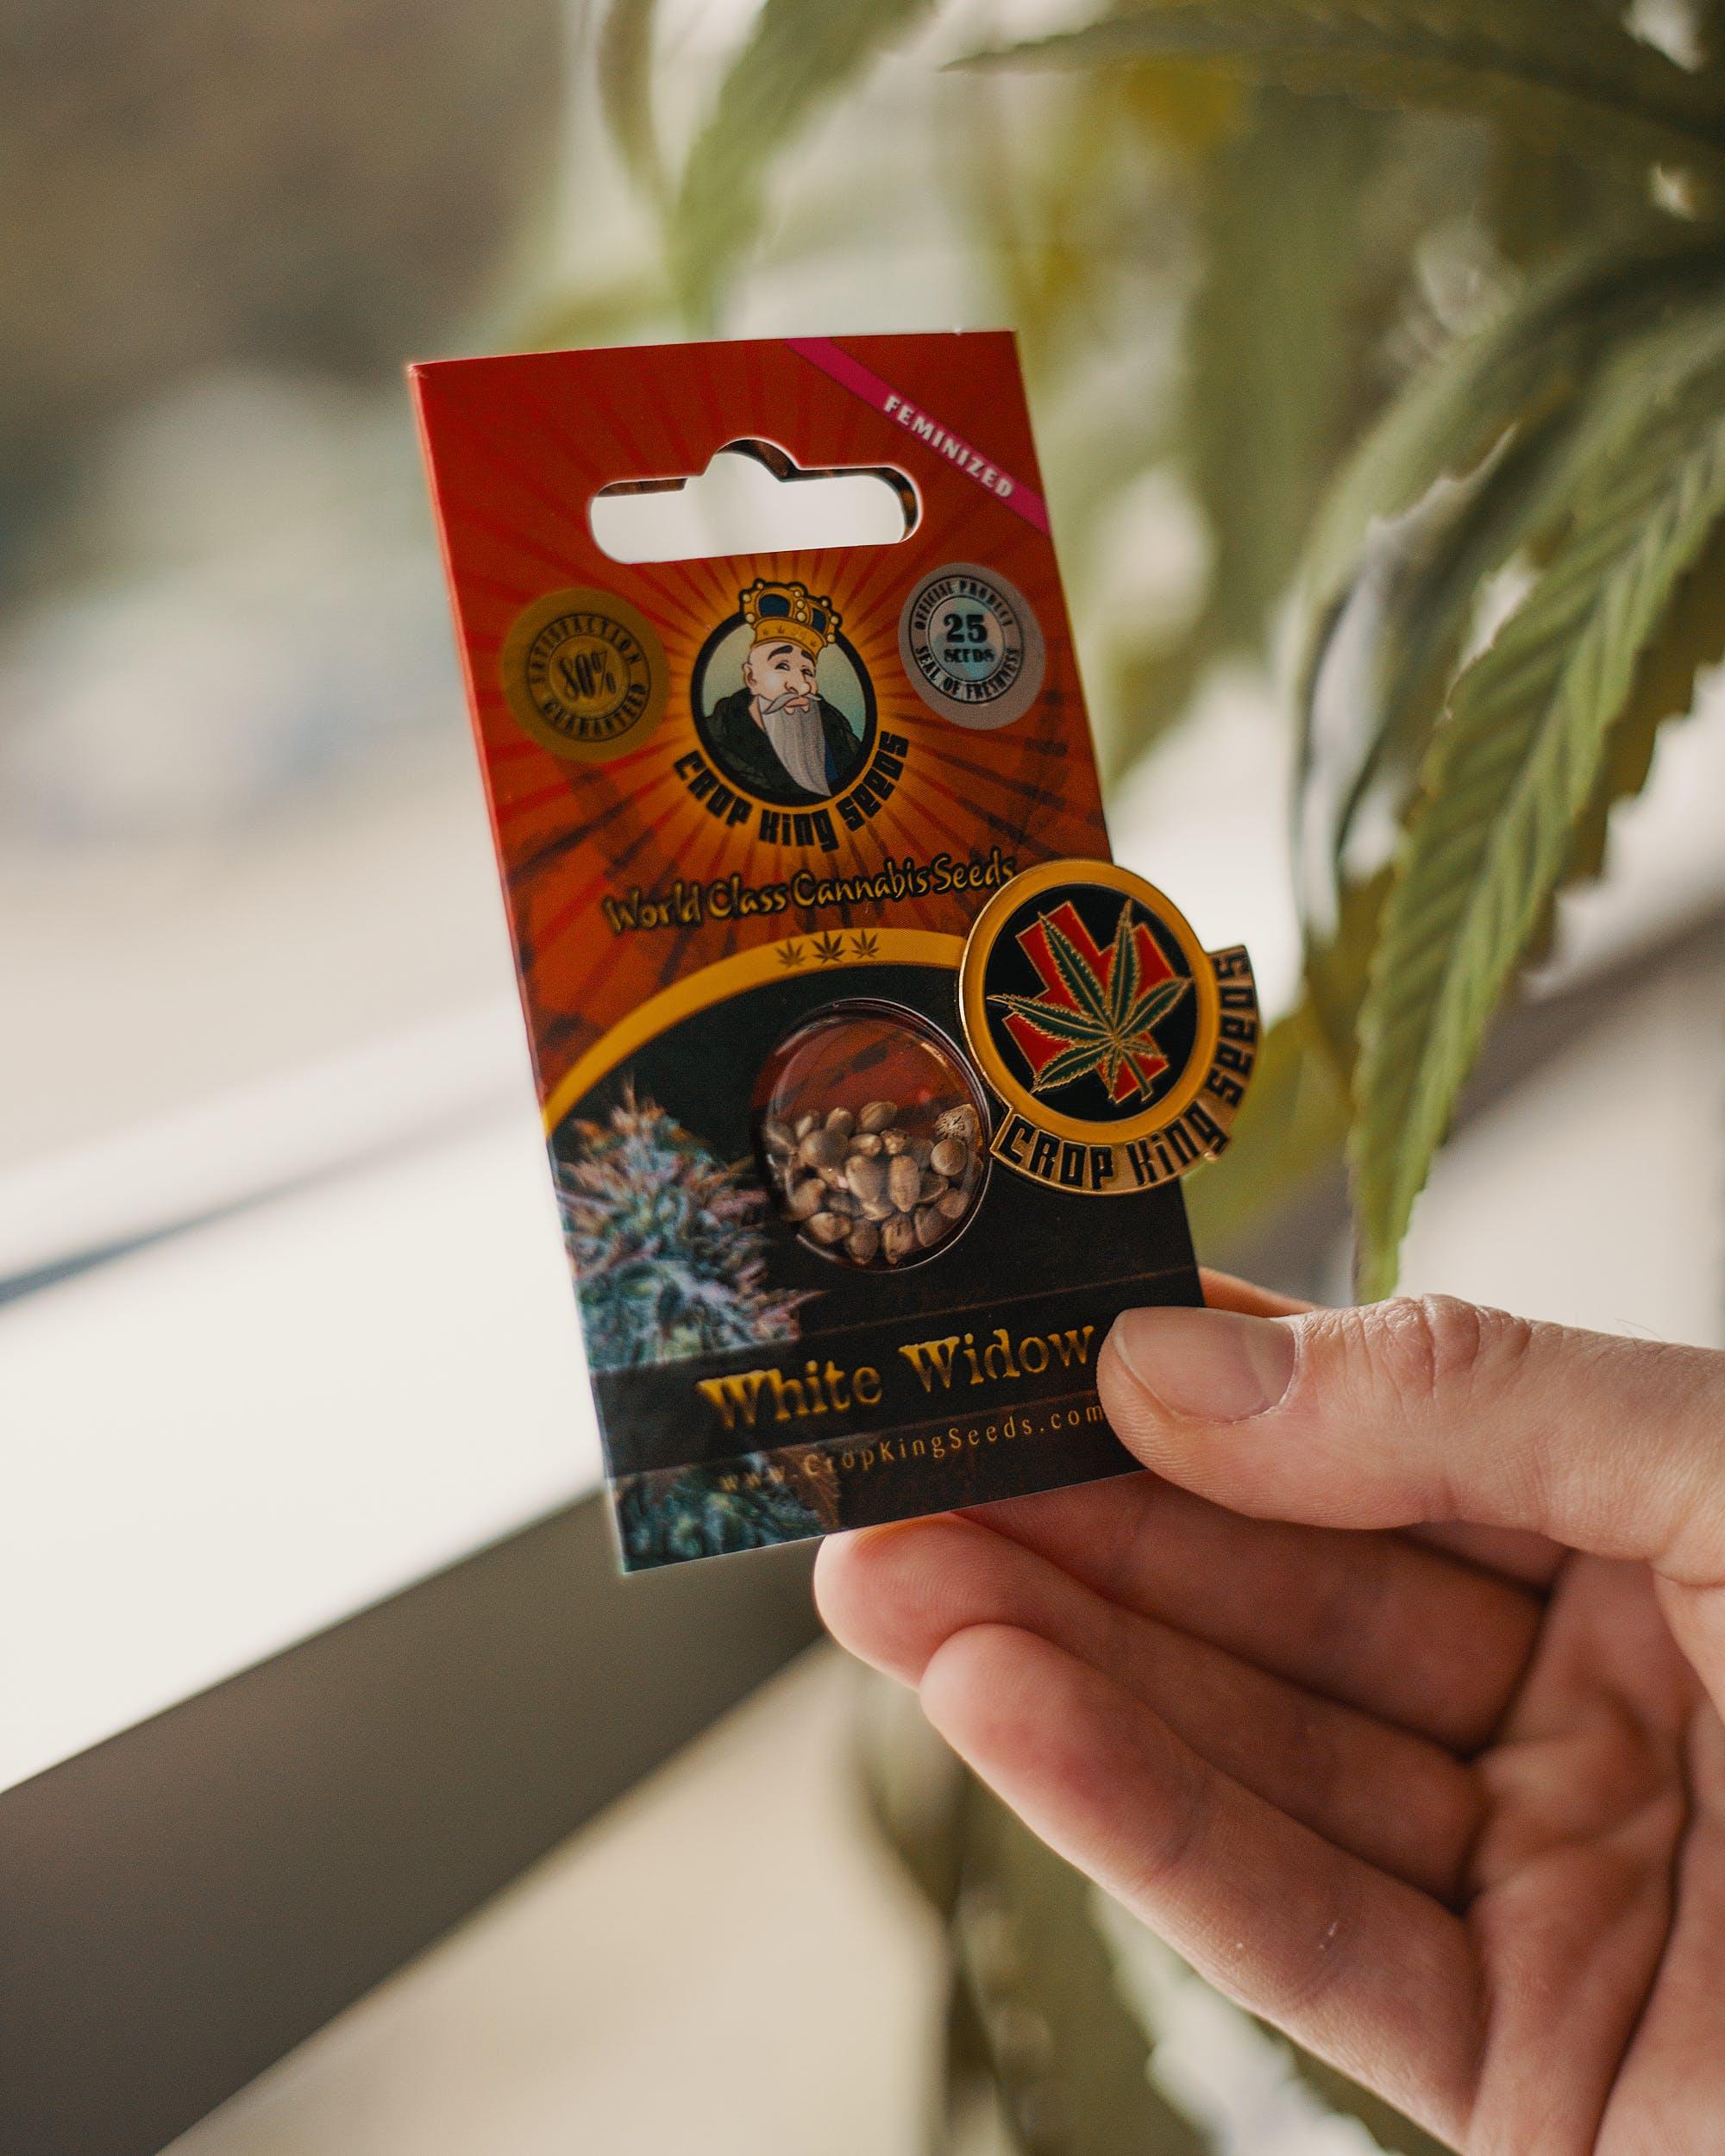 Marijuana Seeds 71 How to Buy Marijuana Seeds That Will Yield Perfect Bud